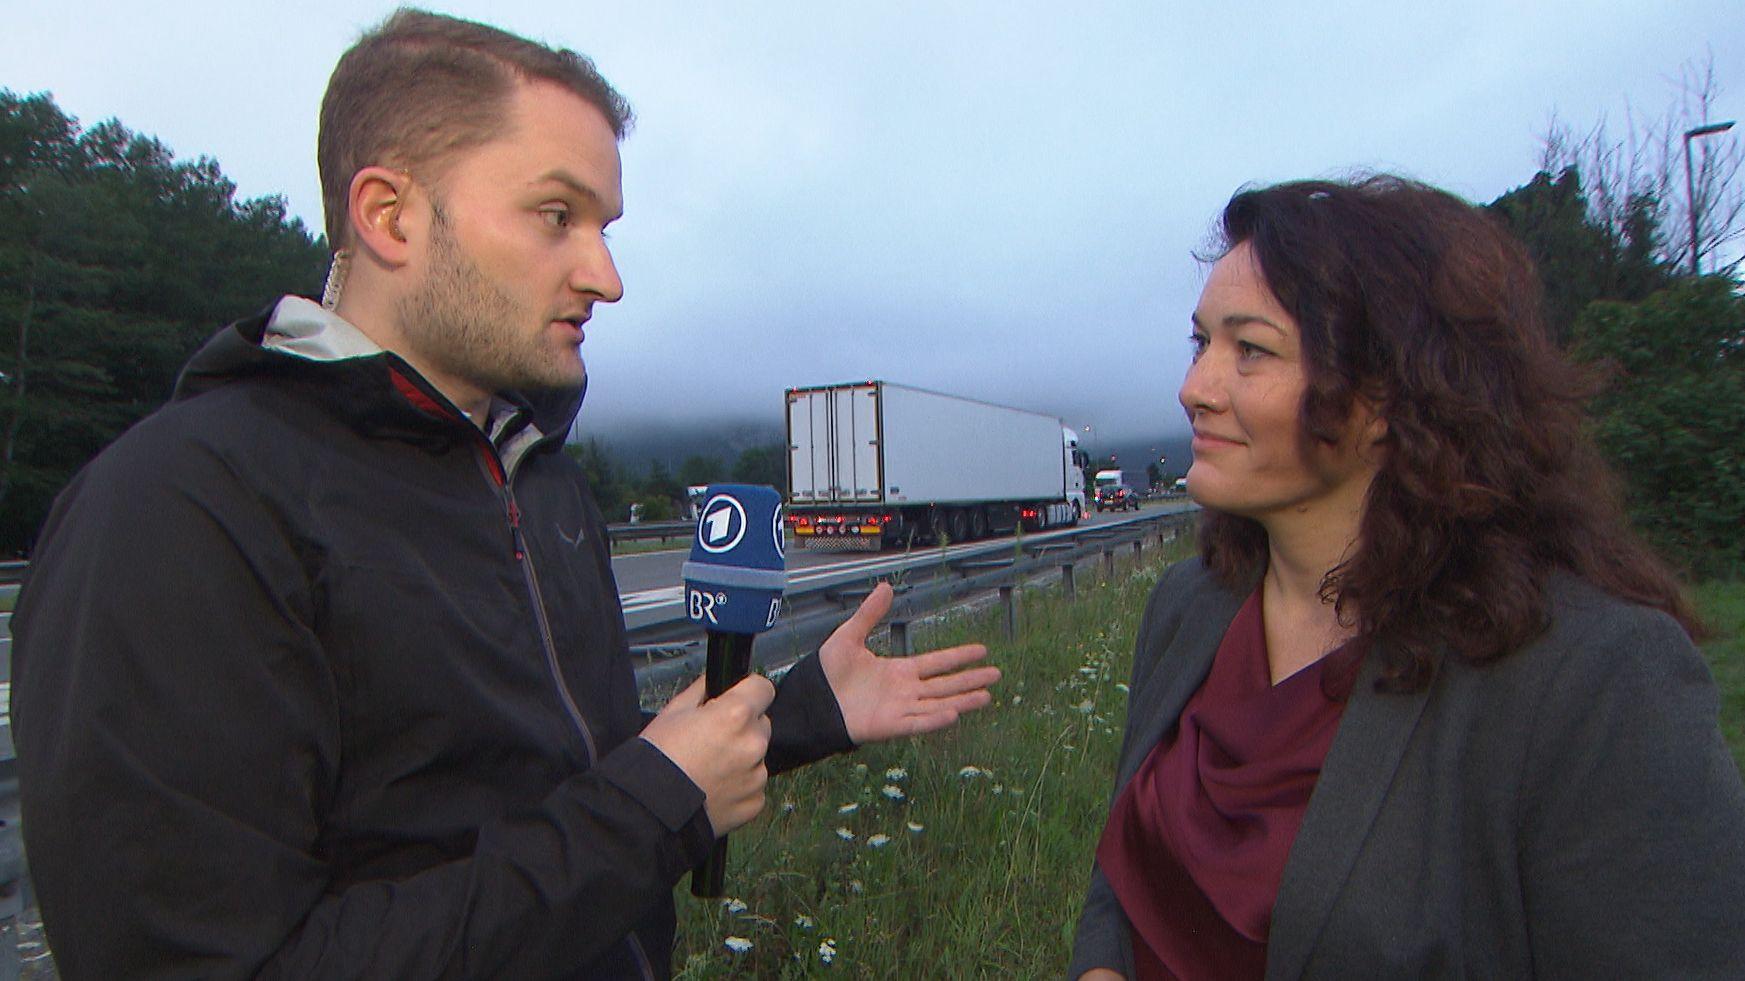 Ingrid Felipe (Die Grünen), Tiroler Verkehrslandesrätin im Gespräch mit BR Reporter Jannik Penz